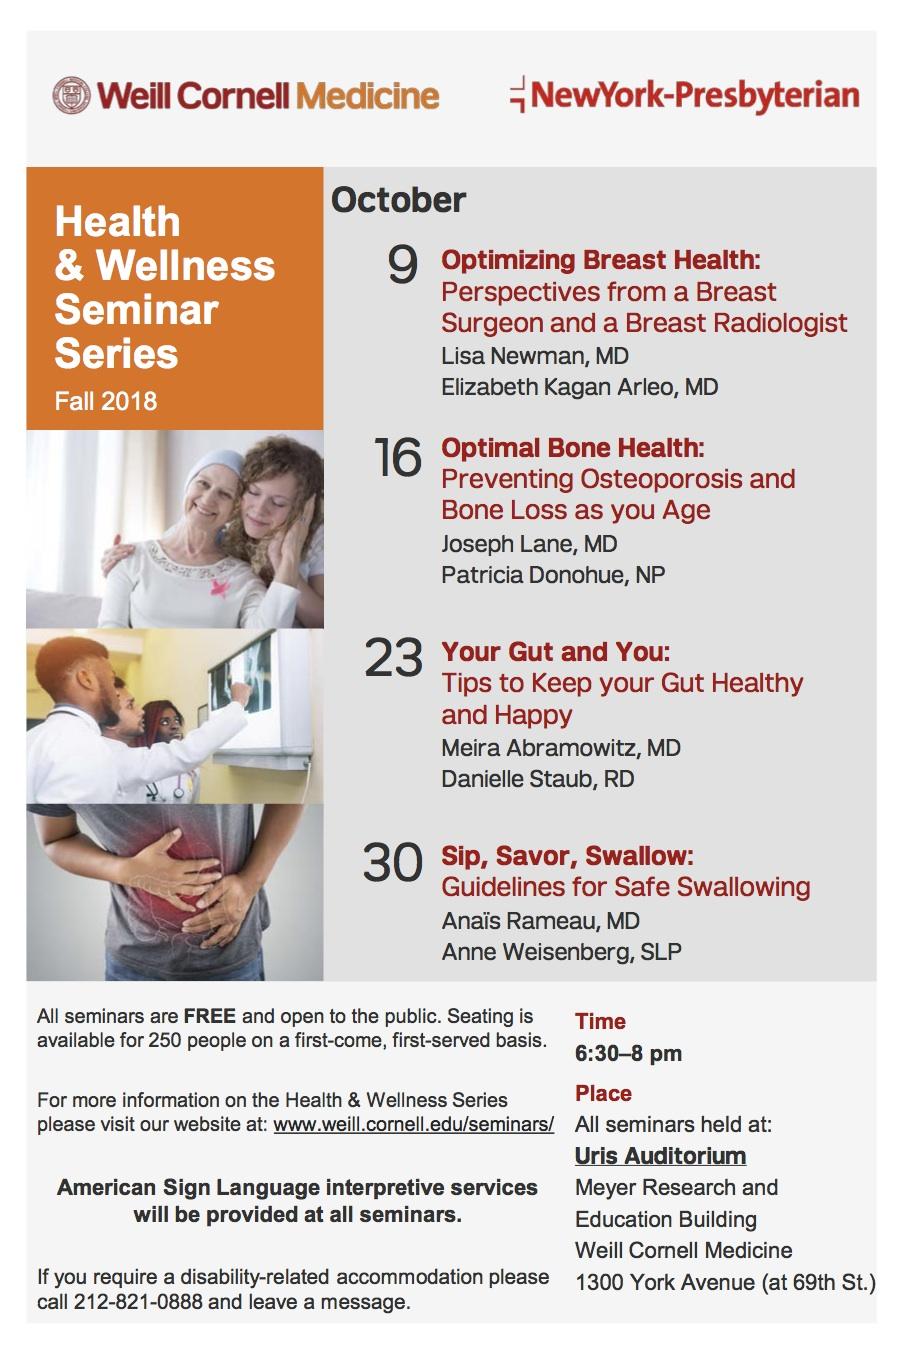 Weill Cornell Medicine/ NY Presbyterian Fall 2018 Health & Wellness Seminars